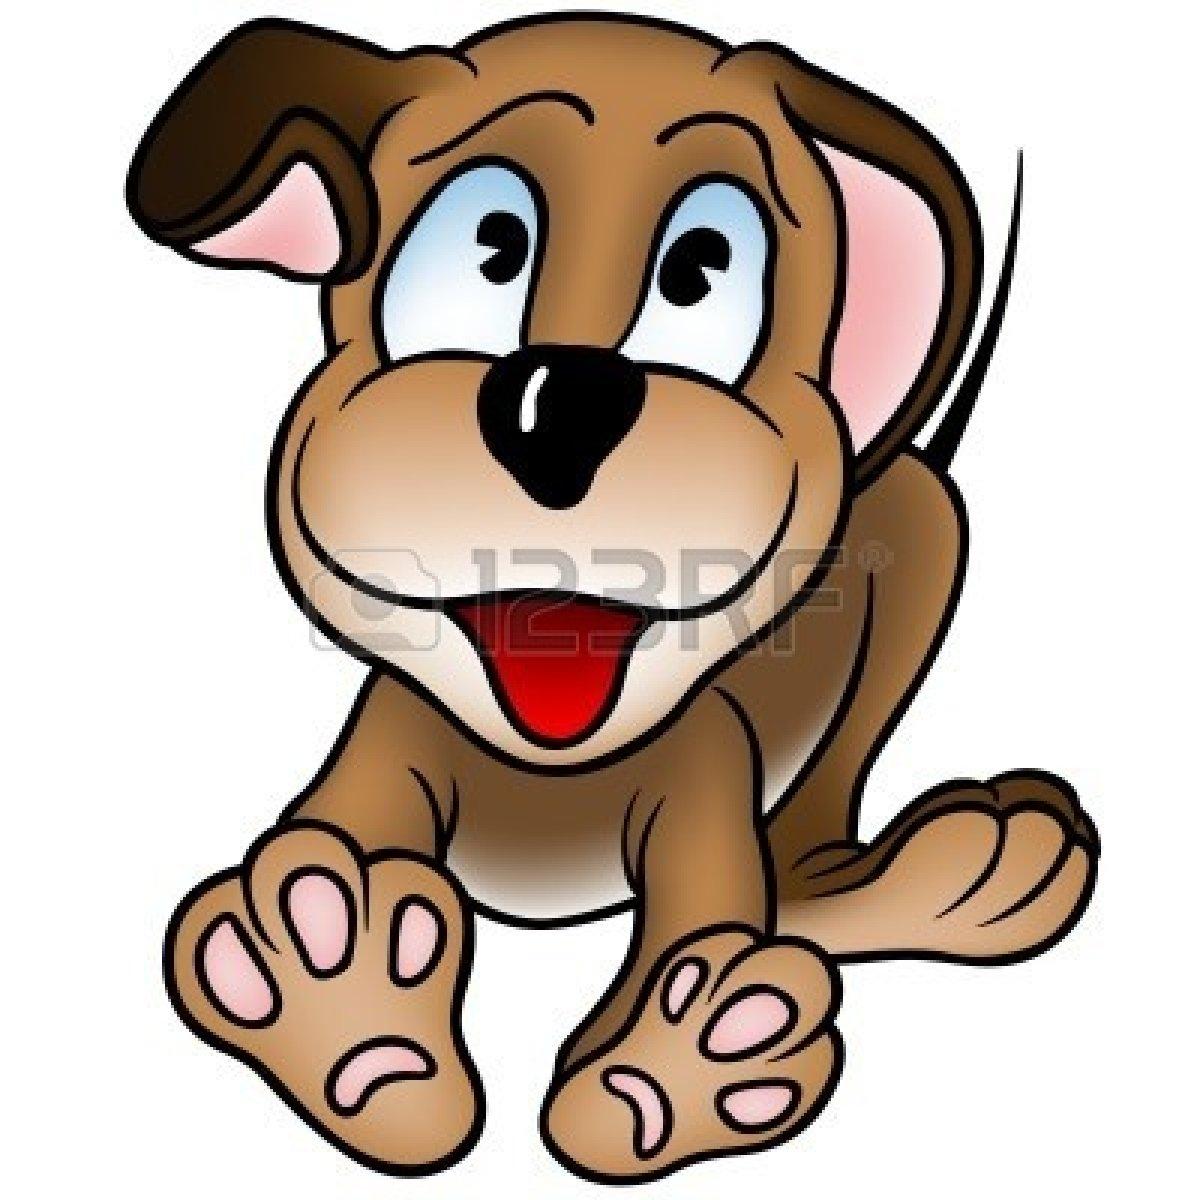 Animated Puppy.